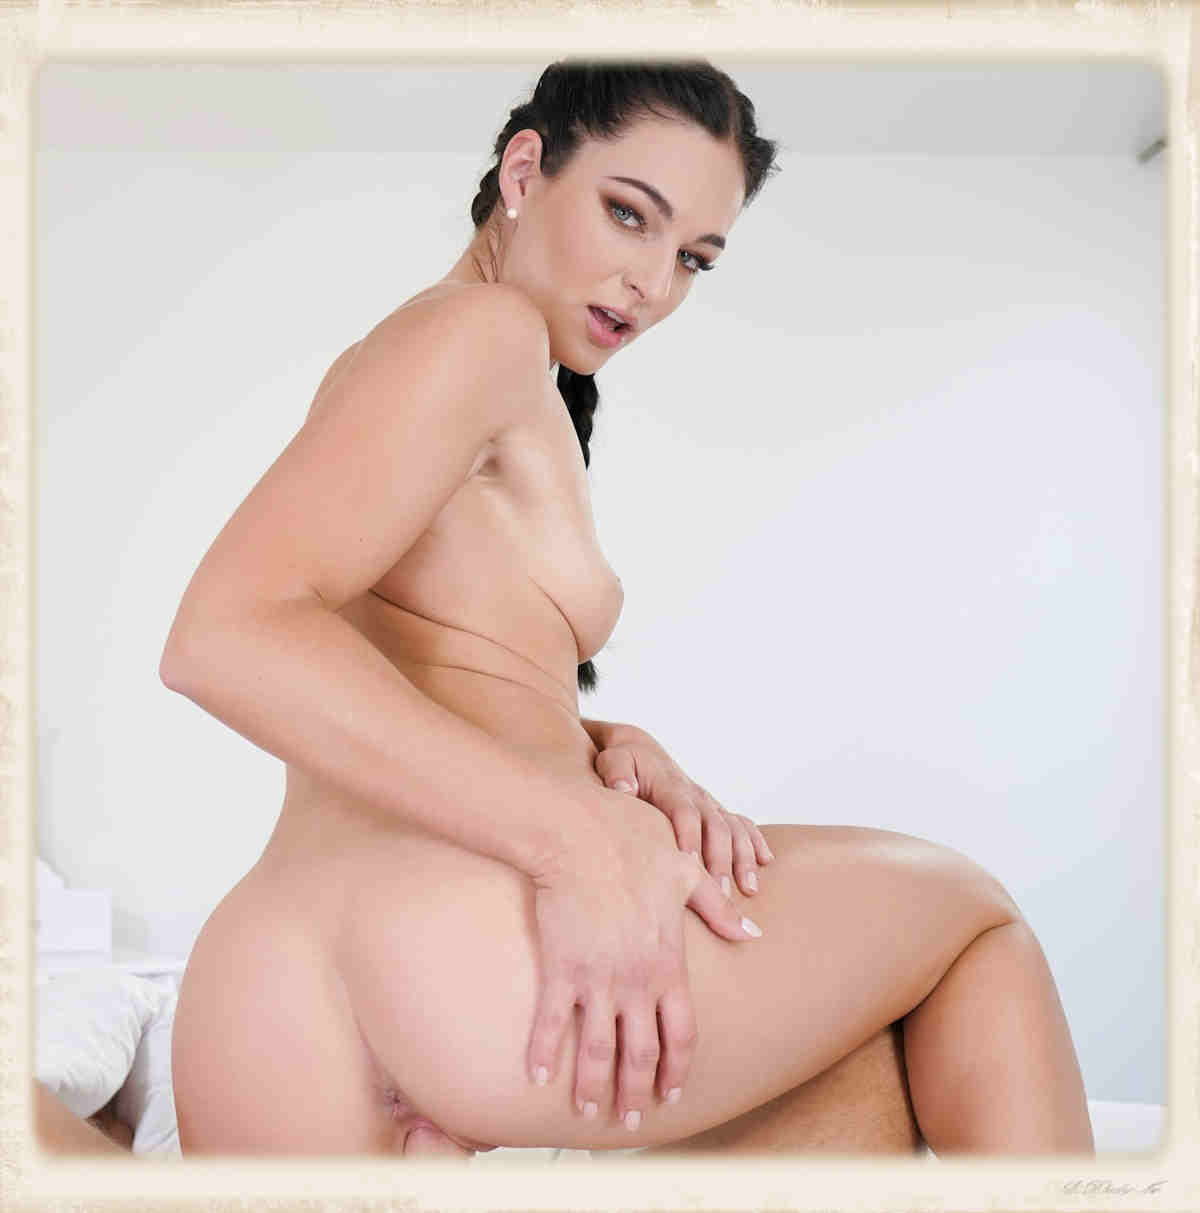 Sexbabes VR Lee Anne reverse cowgirl lookback